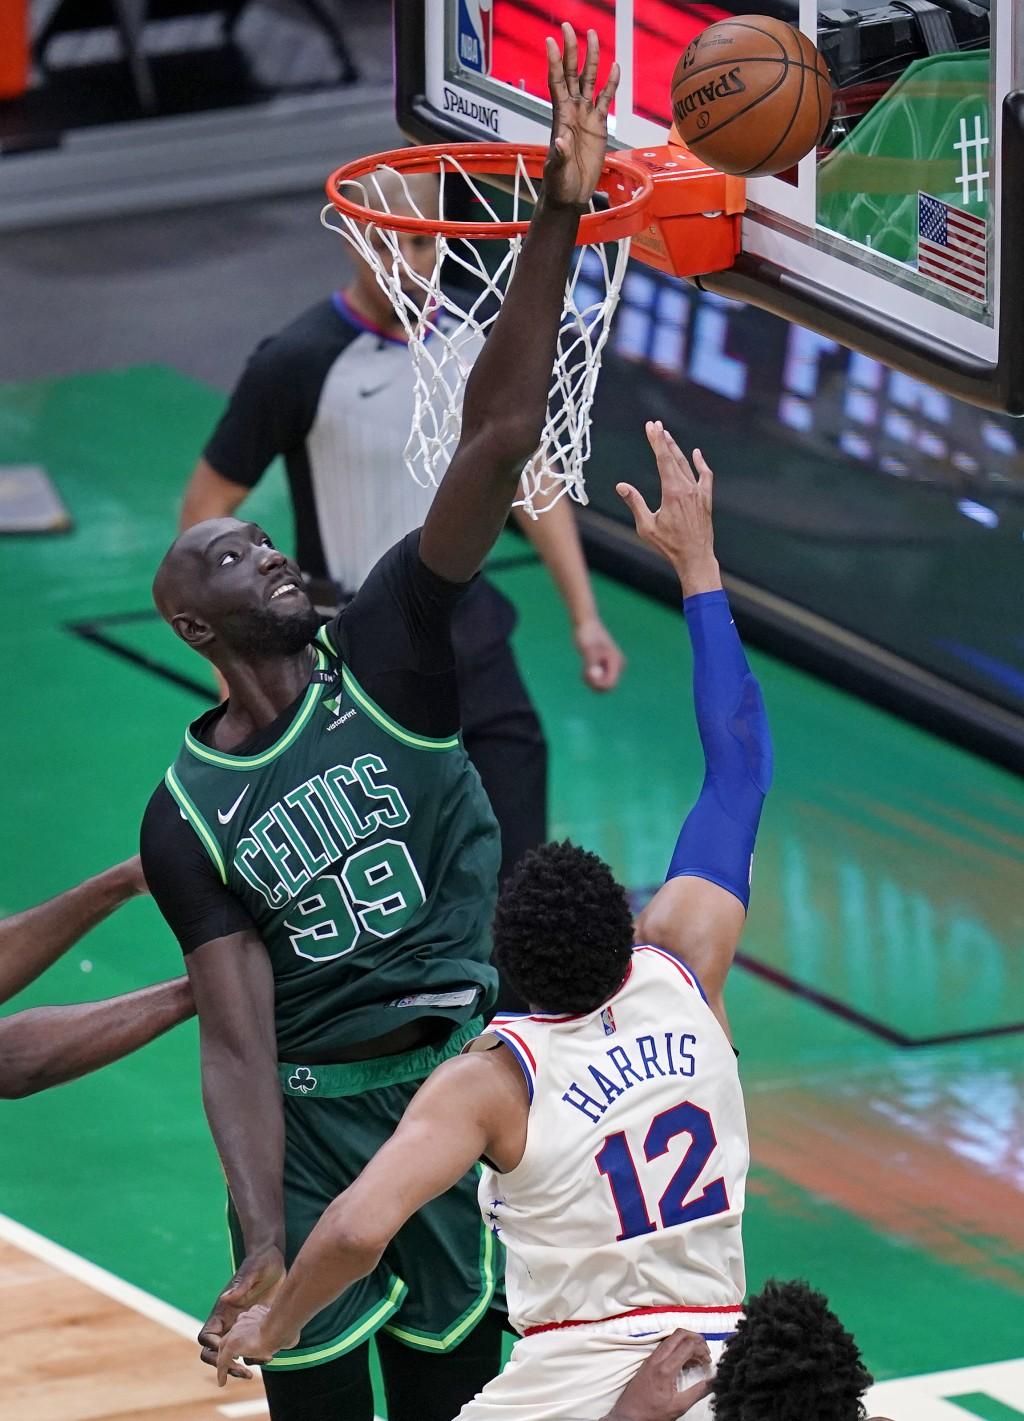 Boston Celtics center Tacko Fall (99) reaches to block a shot by Philadelphia 76ers forward Tobias Harris (12) during the first half of an NBA basketb...